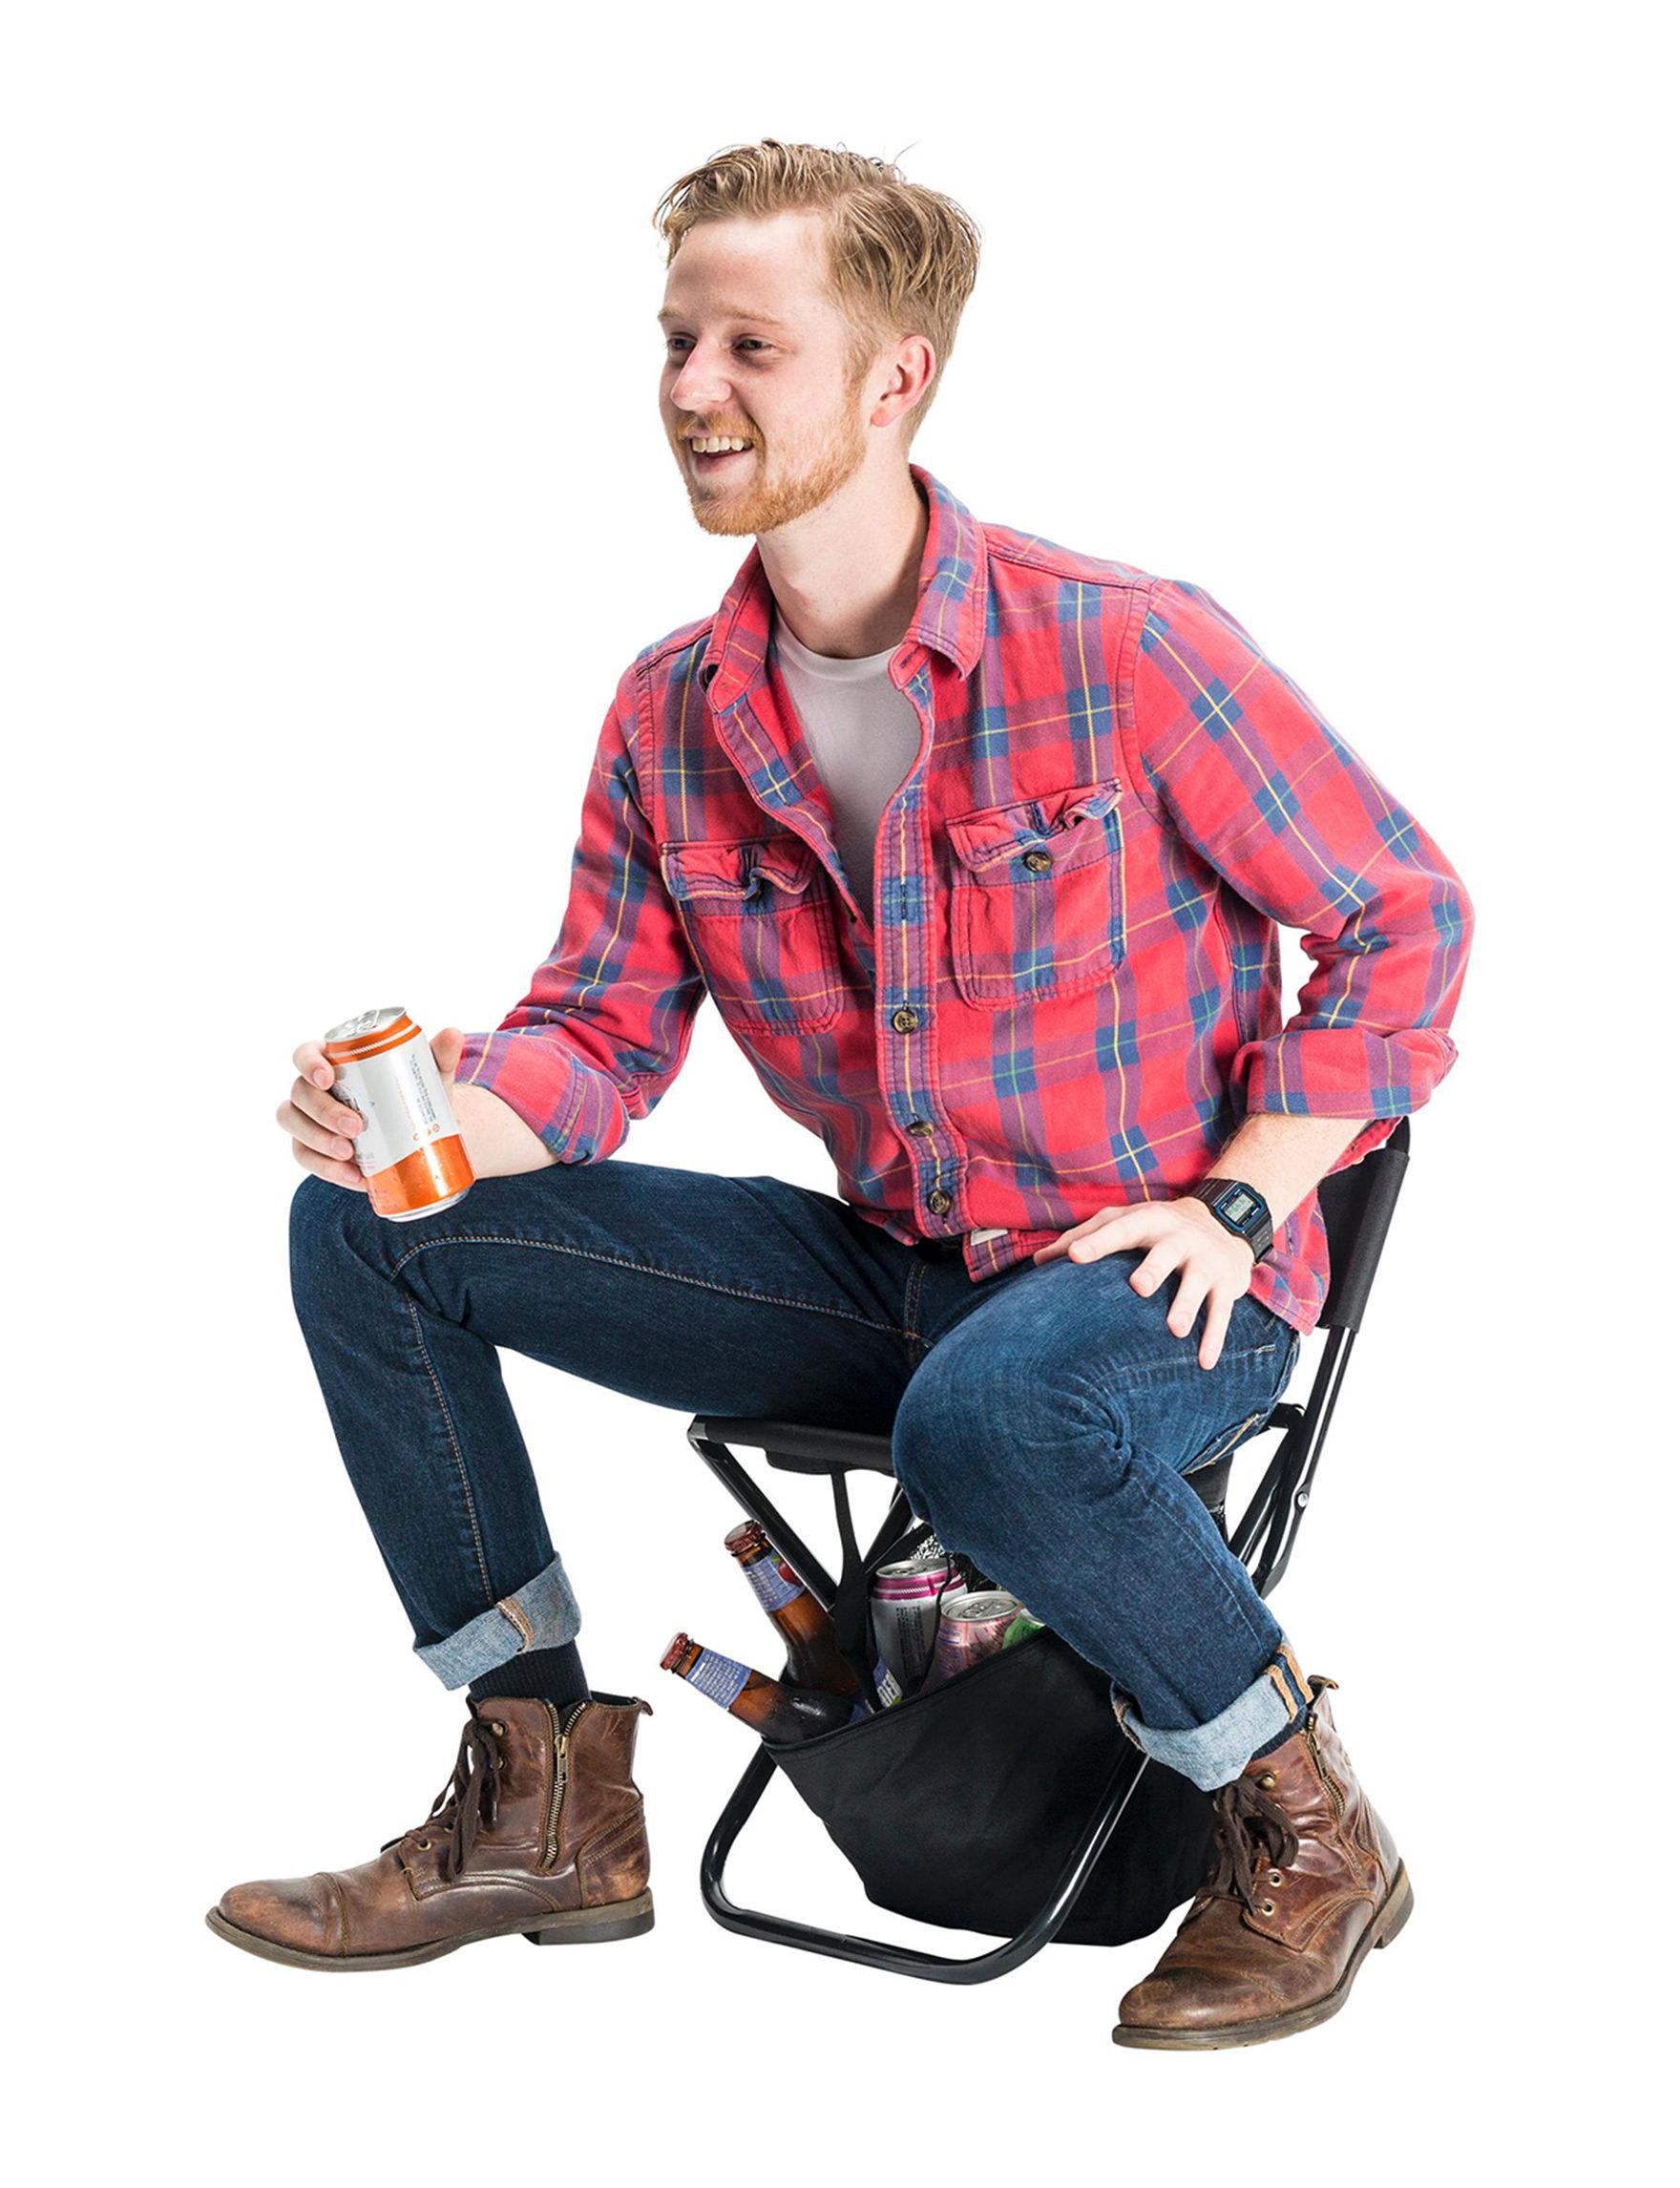 Snag Black Camping & Outdoor Gear